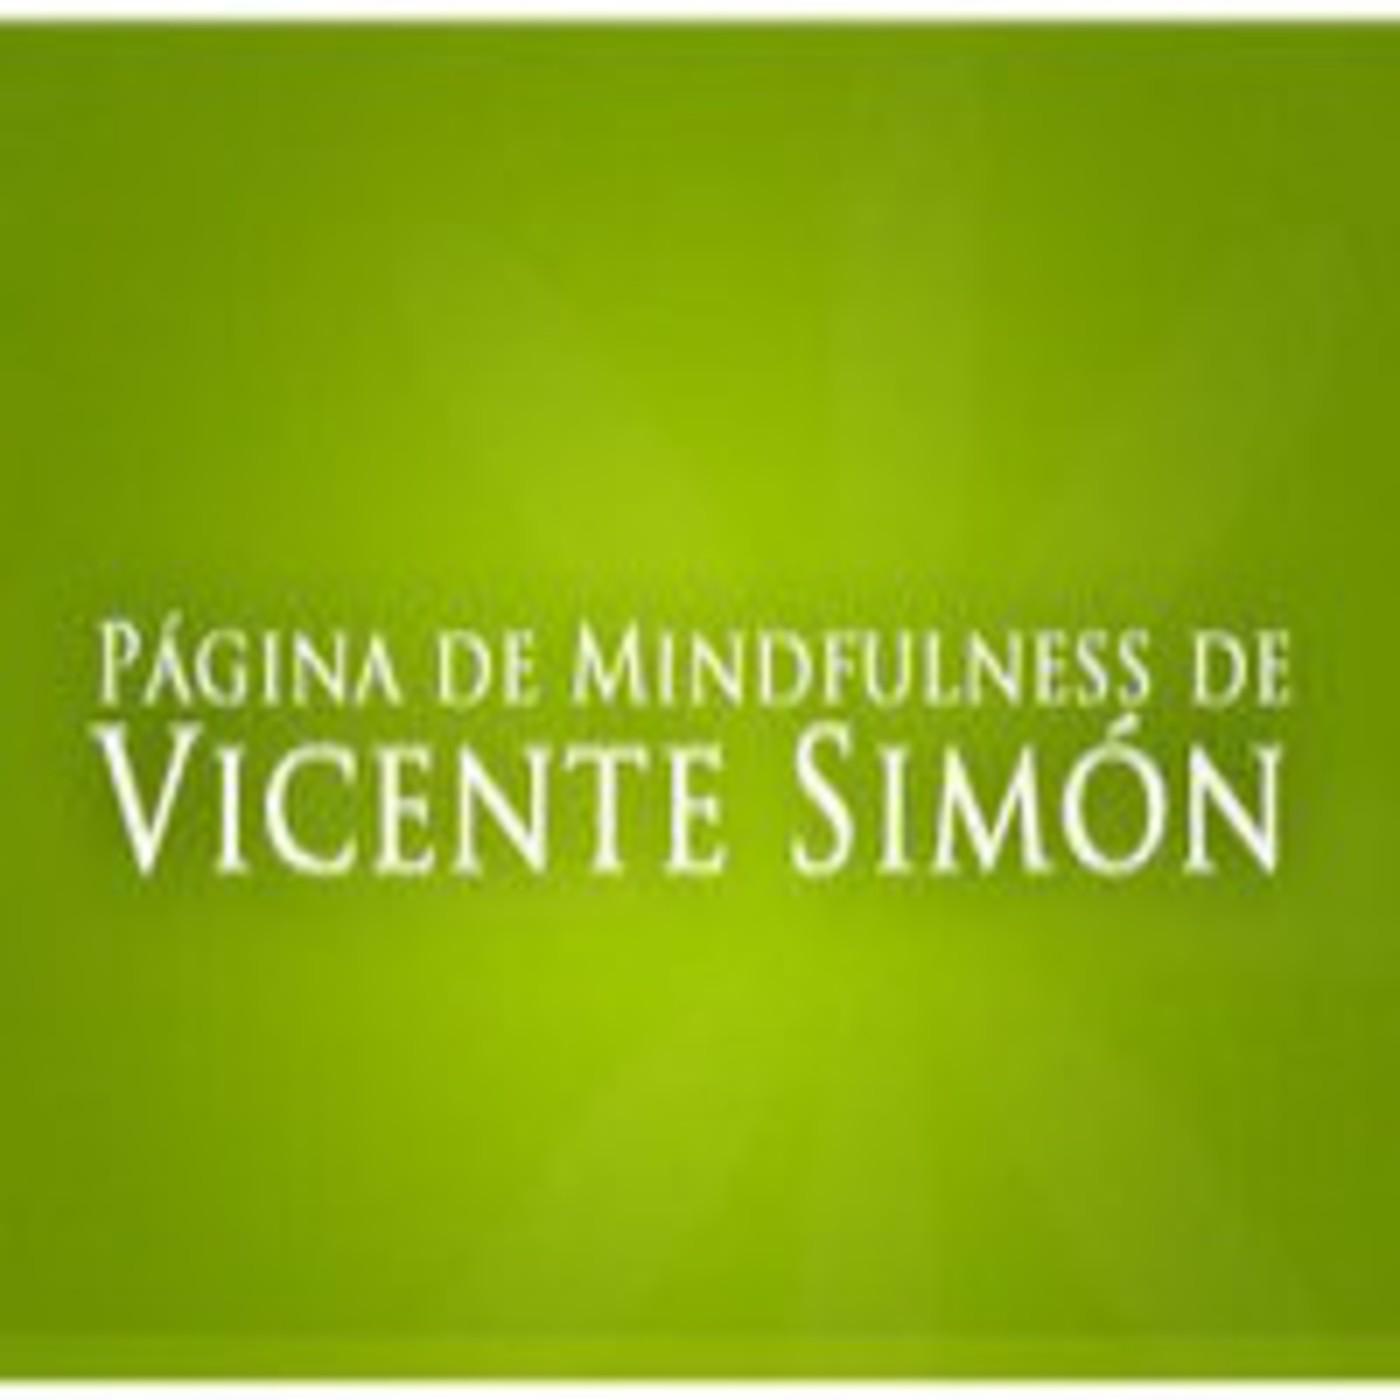 mindfulness Vicente simón